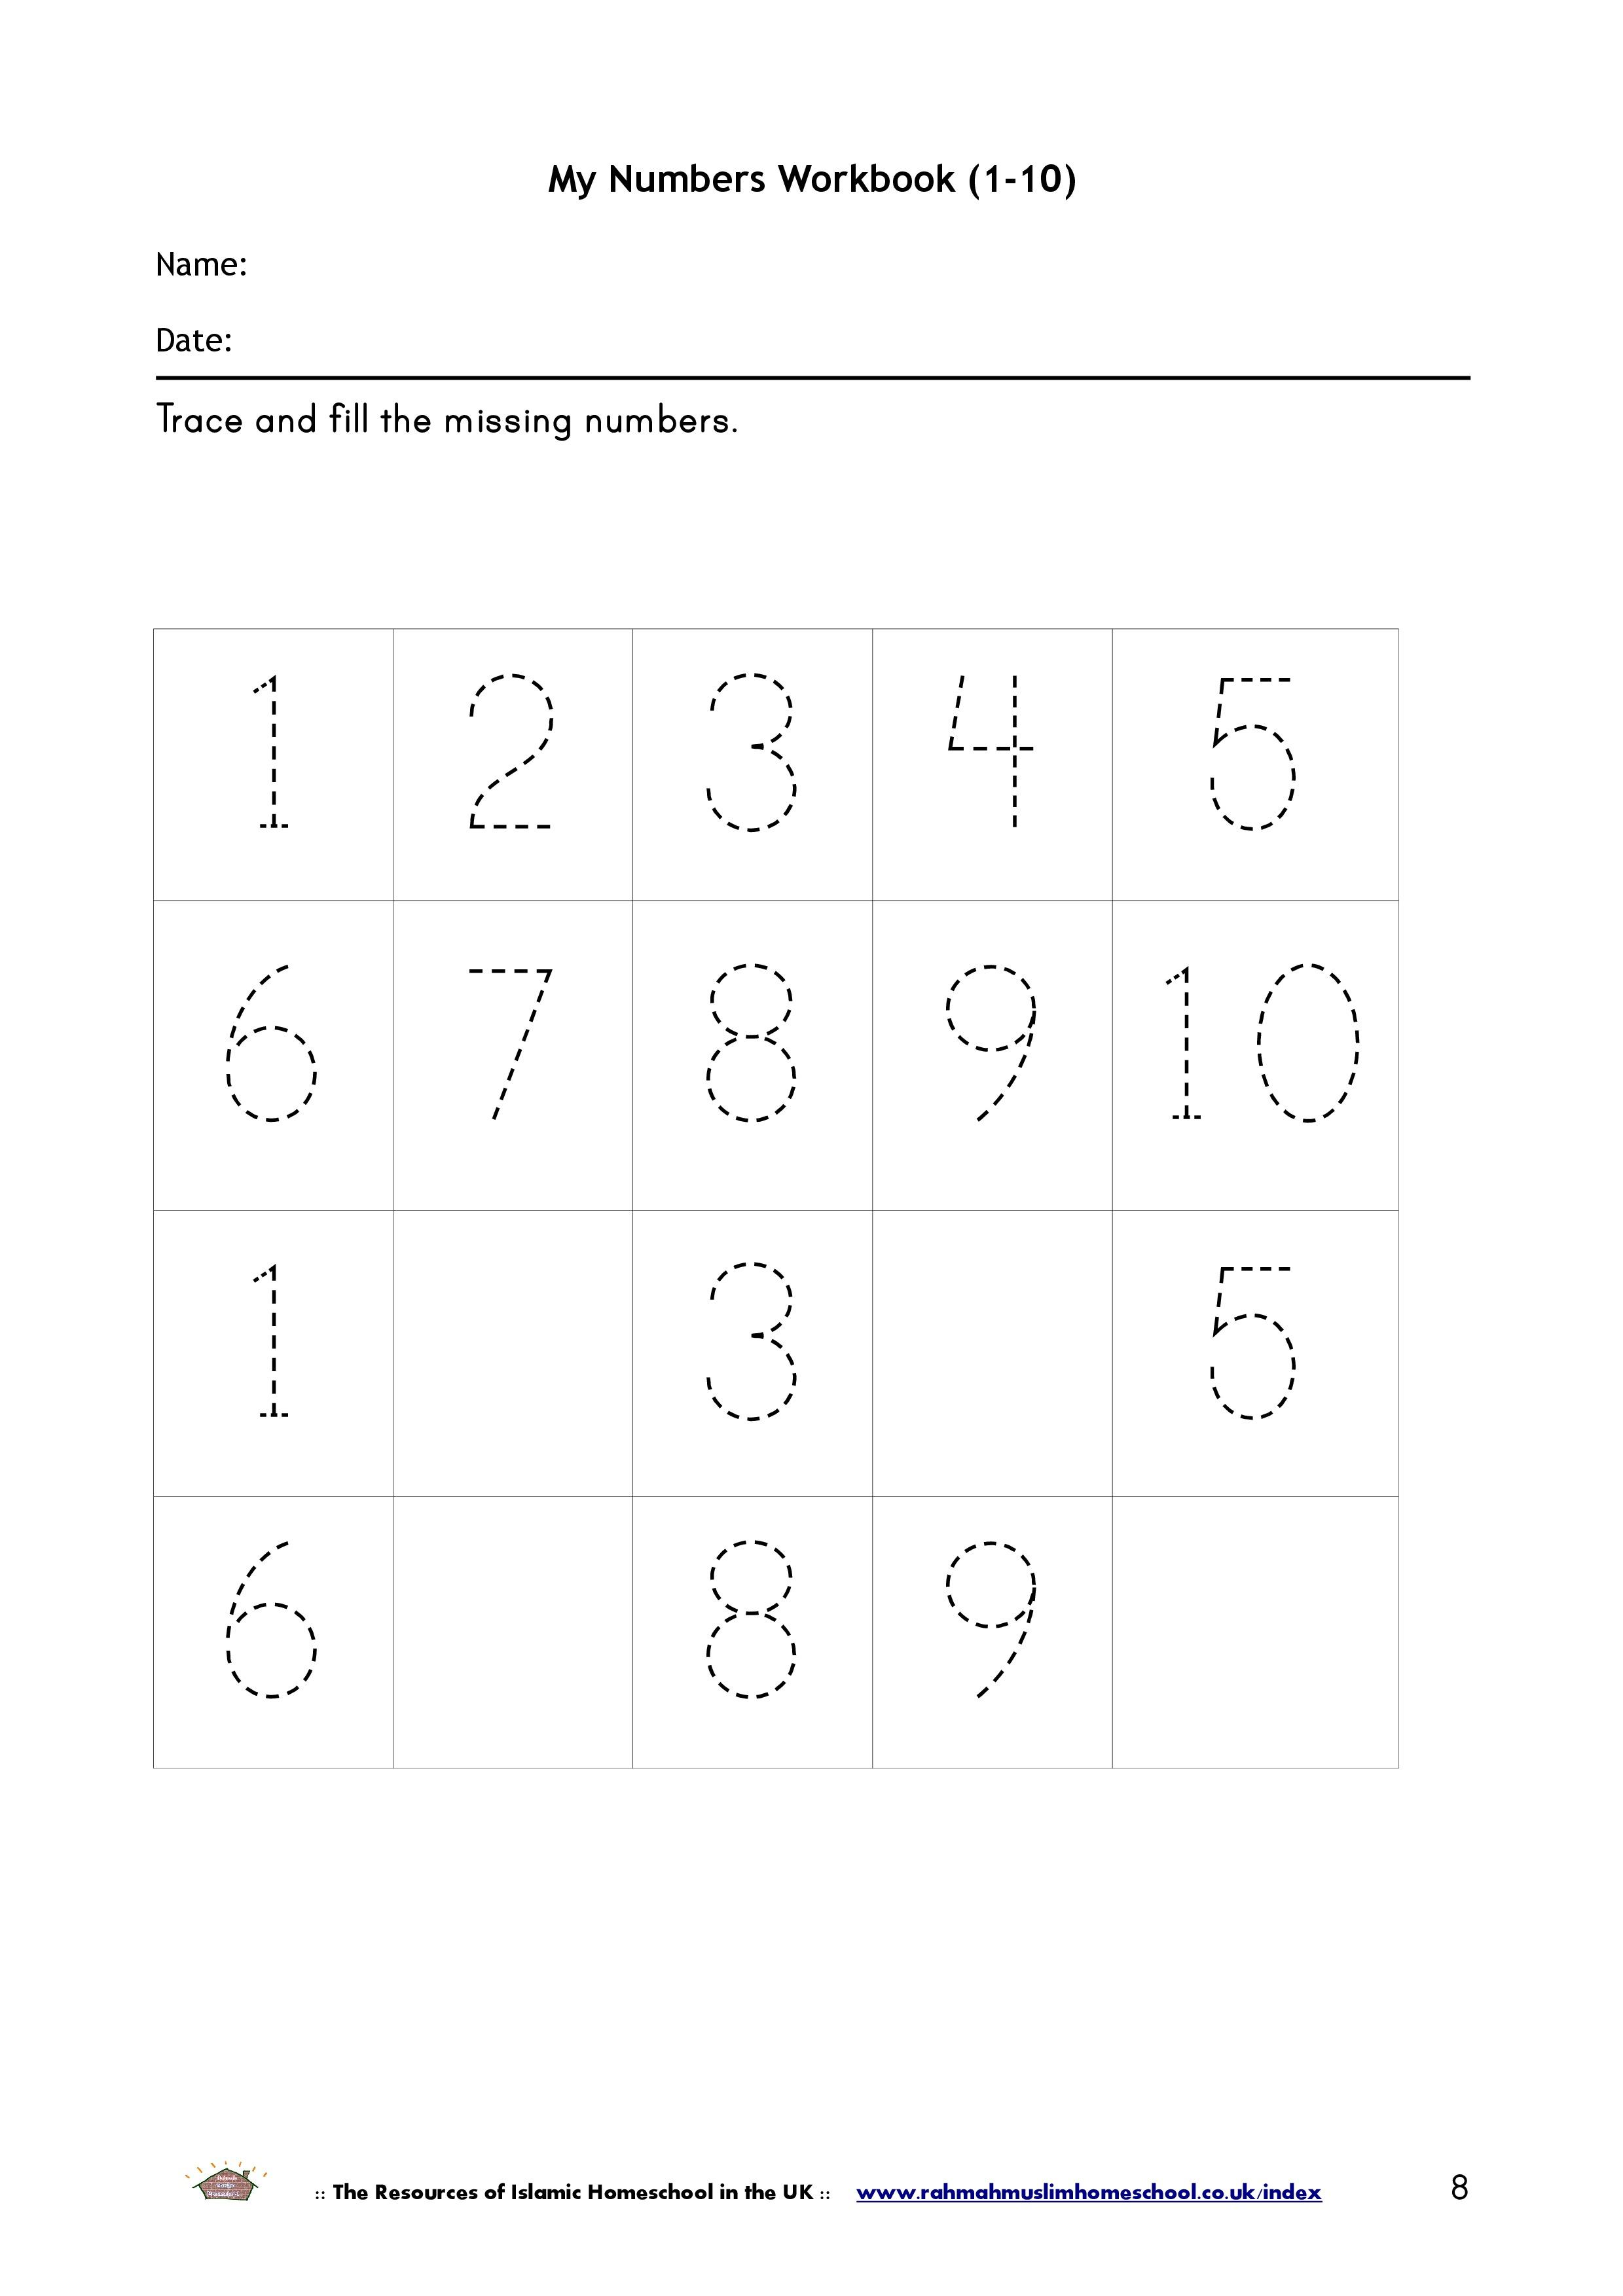 Maths My Numbers Workbook 1 10